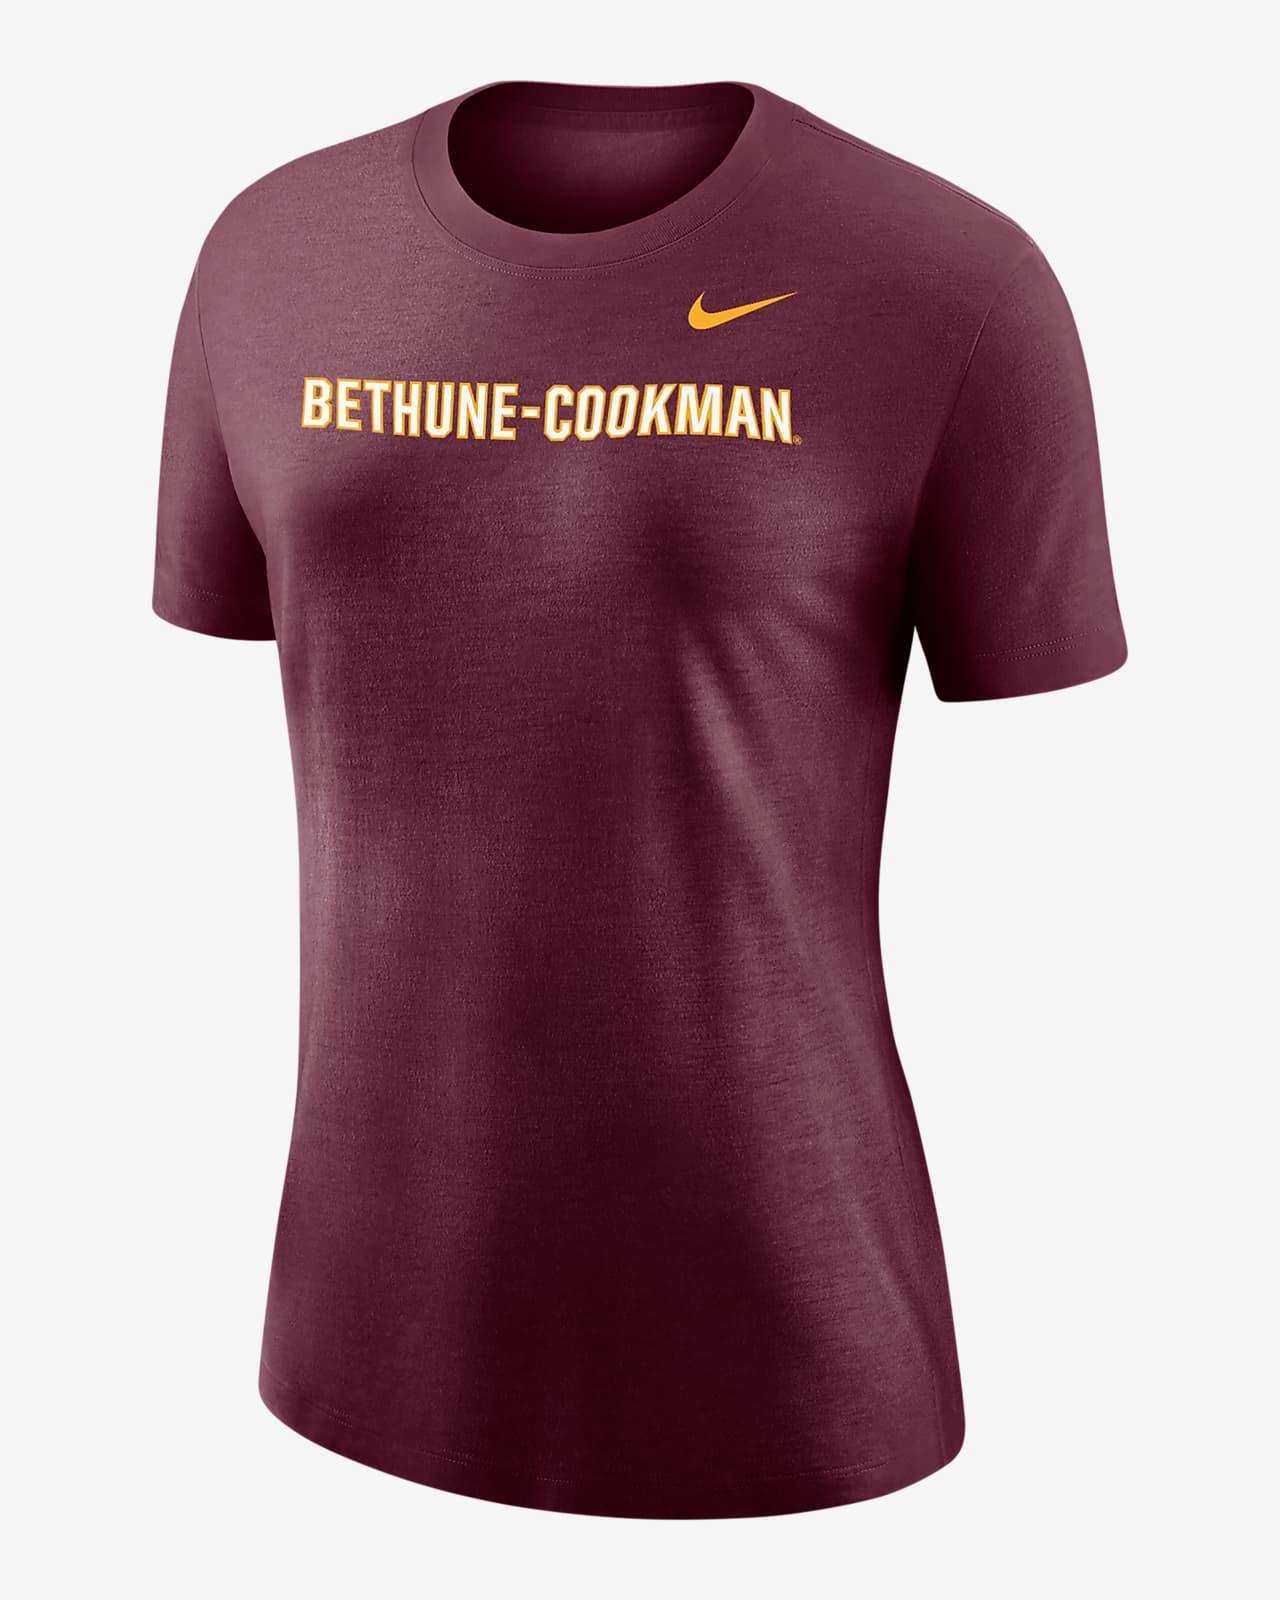 Nike College (Bethune-Cookman) Women's T-Shirt